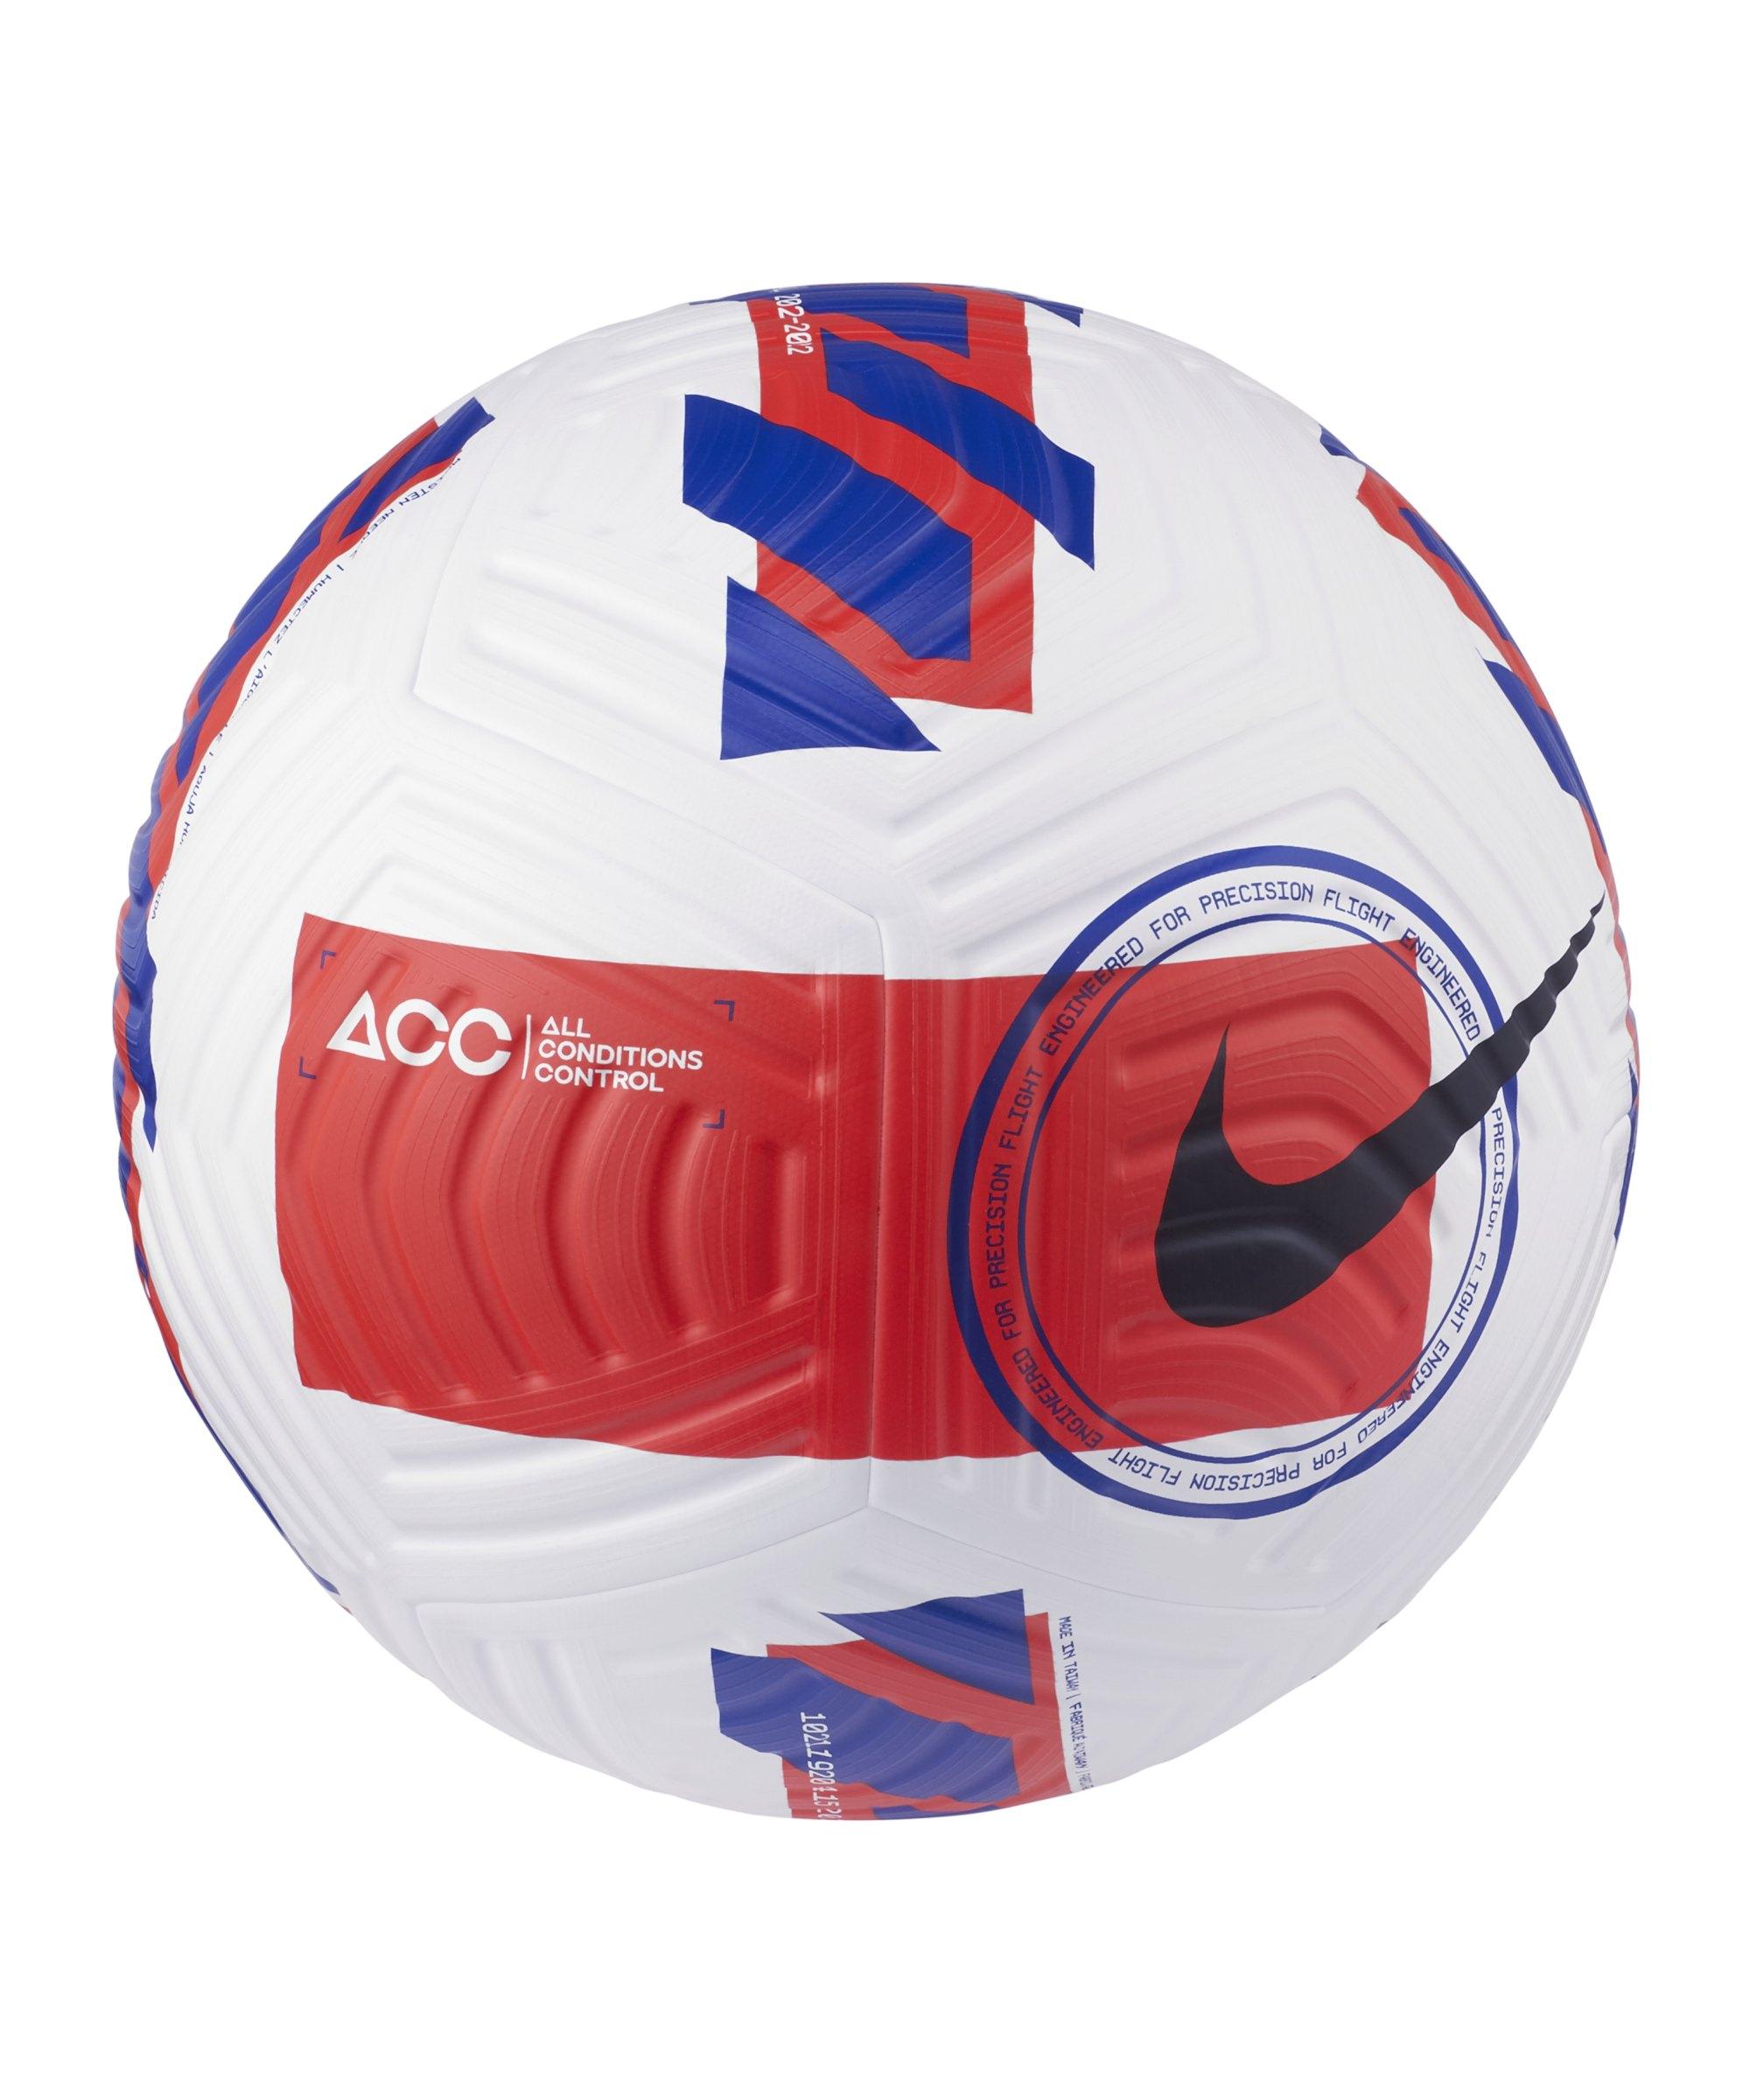 Nike Russland Premier League Flight Spielball F100 - weiss